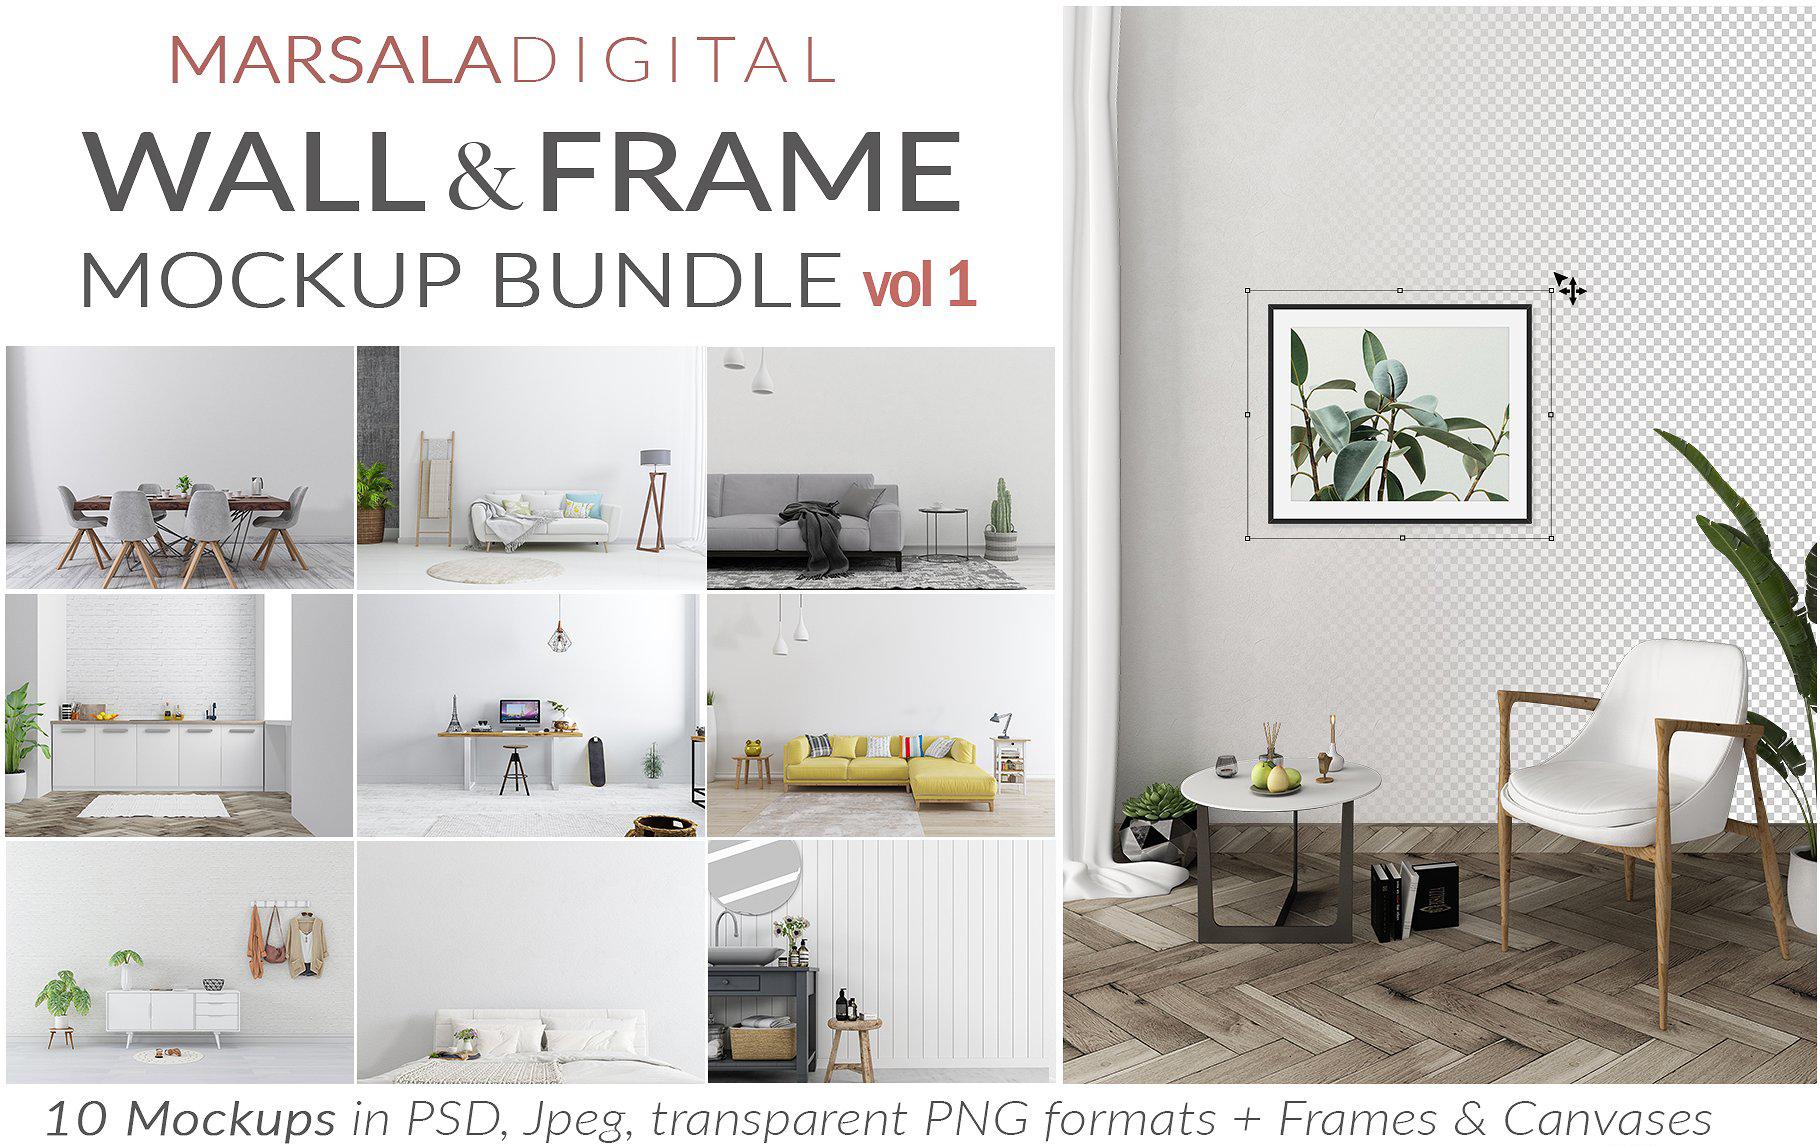 Massive Interior Wall Mockup, Frame Mockup Bundle FREE sampl example image 3